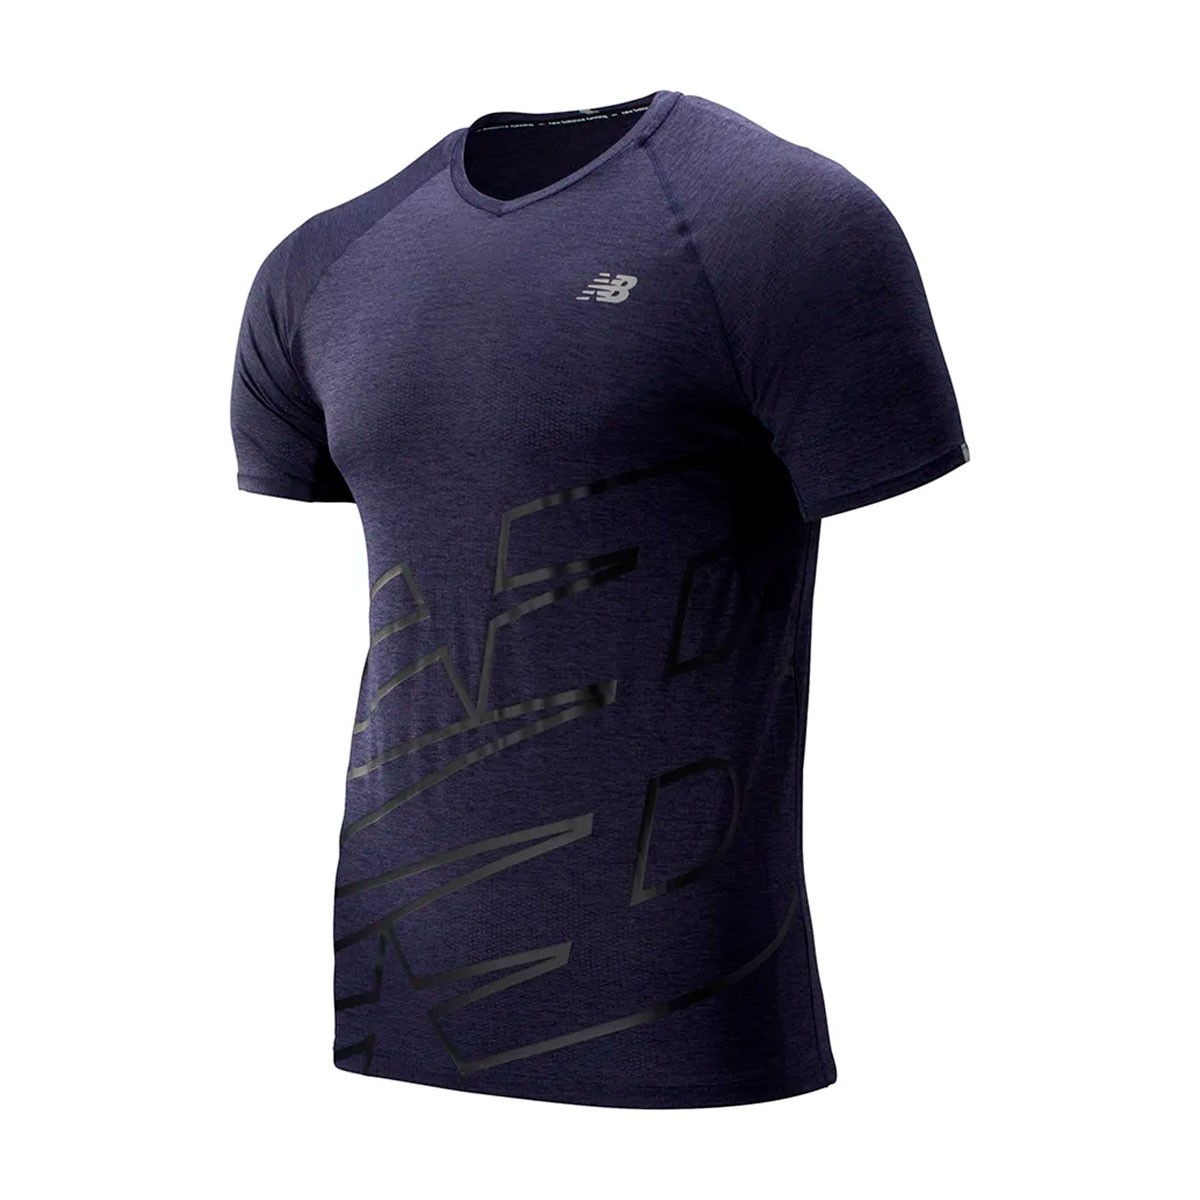 Camiseta New Balance 2.0 Ice Masculino Azul